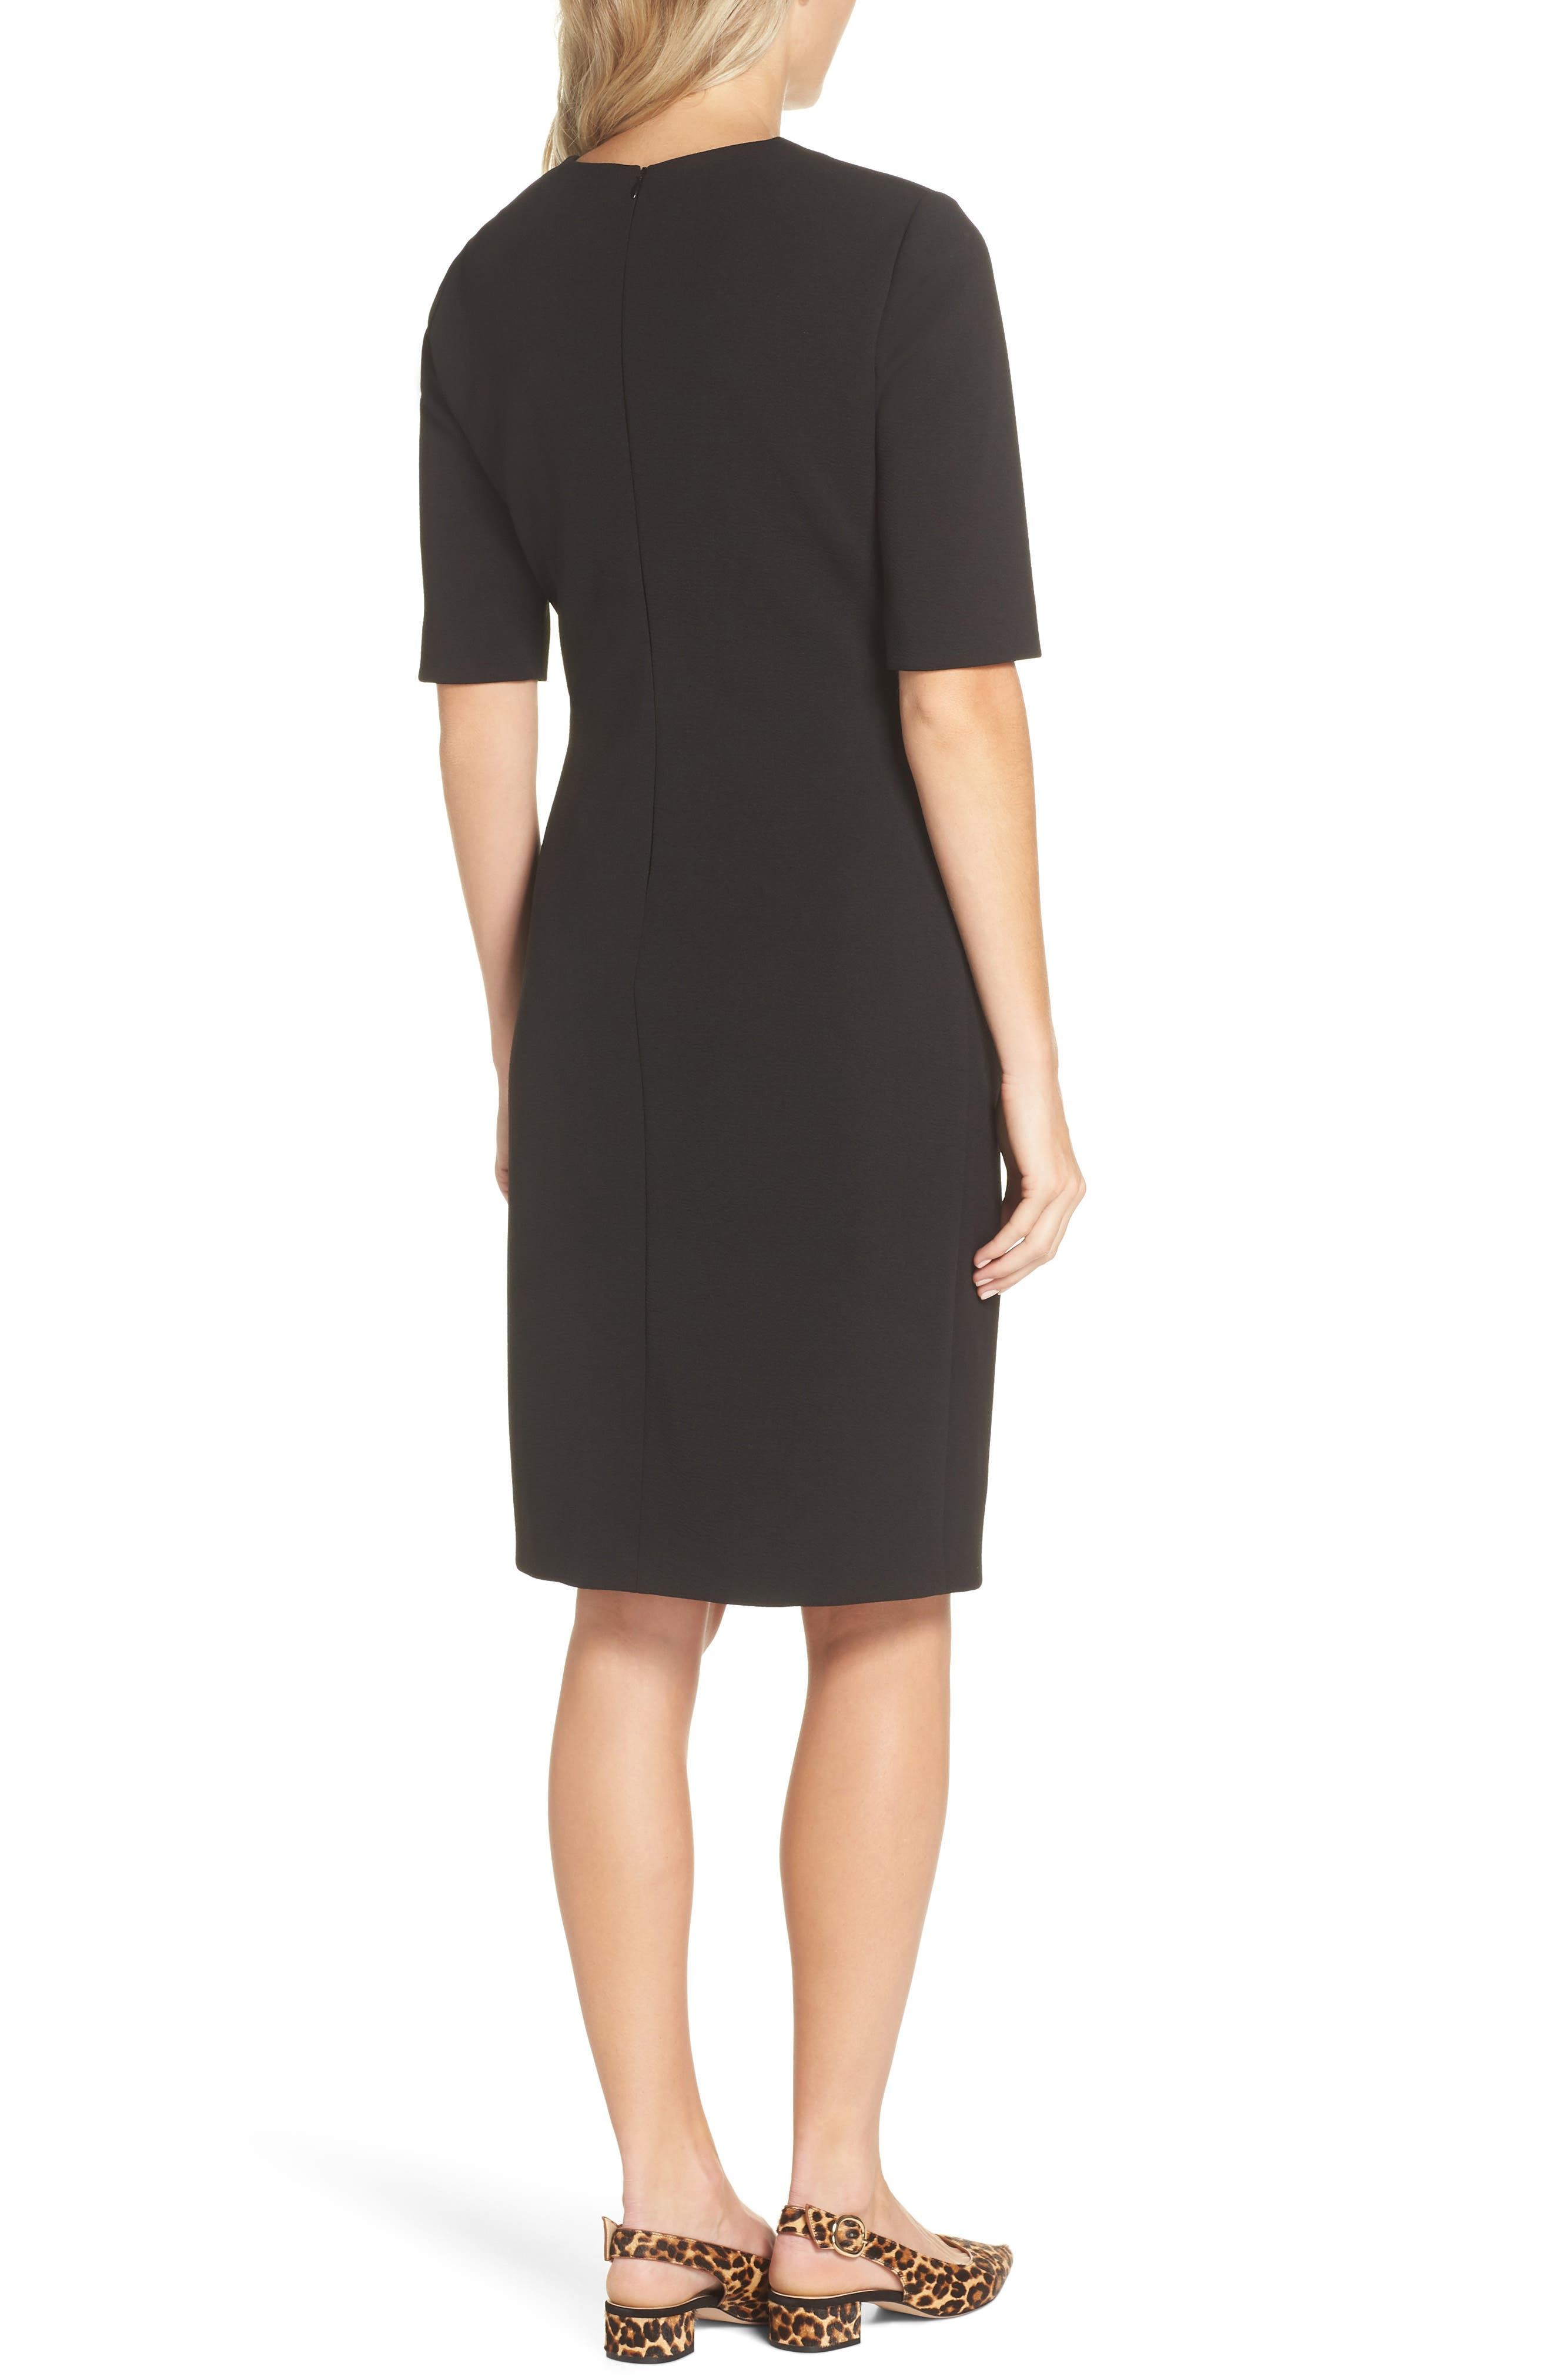 TAHARI, Scuba Crepe Sheath Dress, Alternate thumbnail 2, color, BLACK